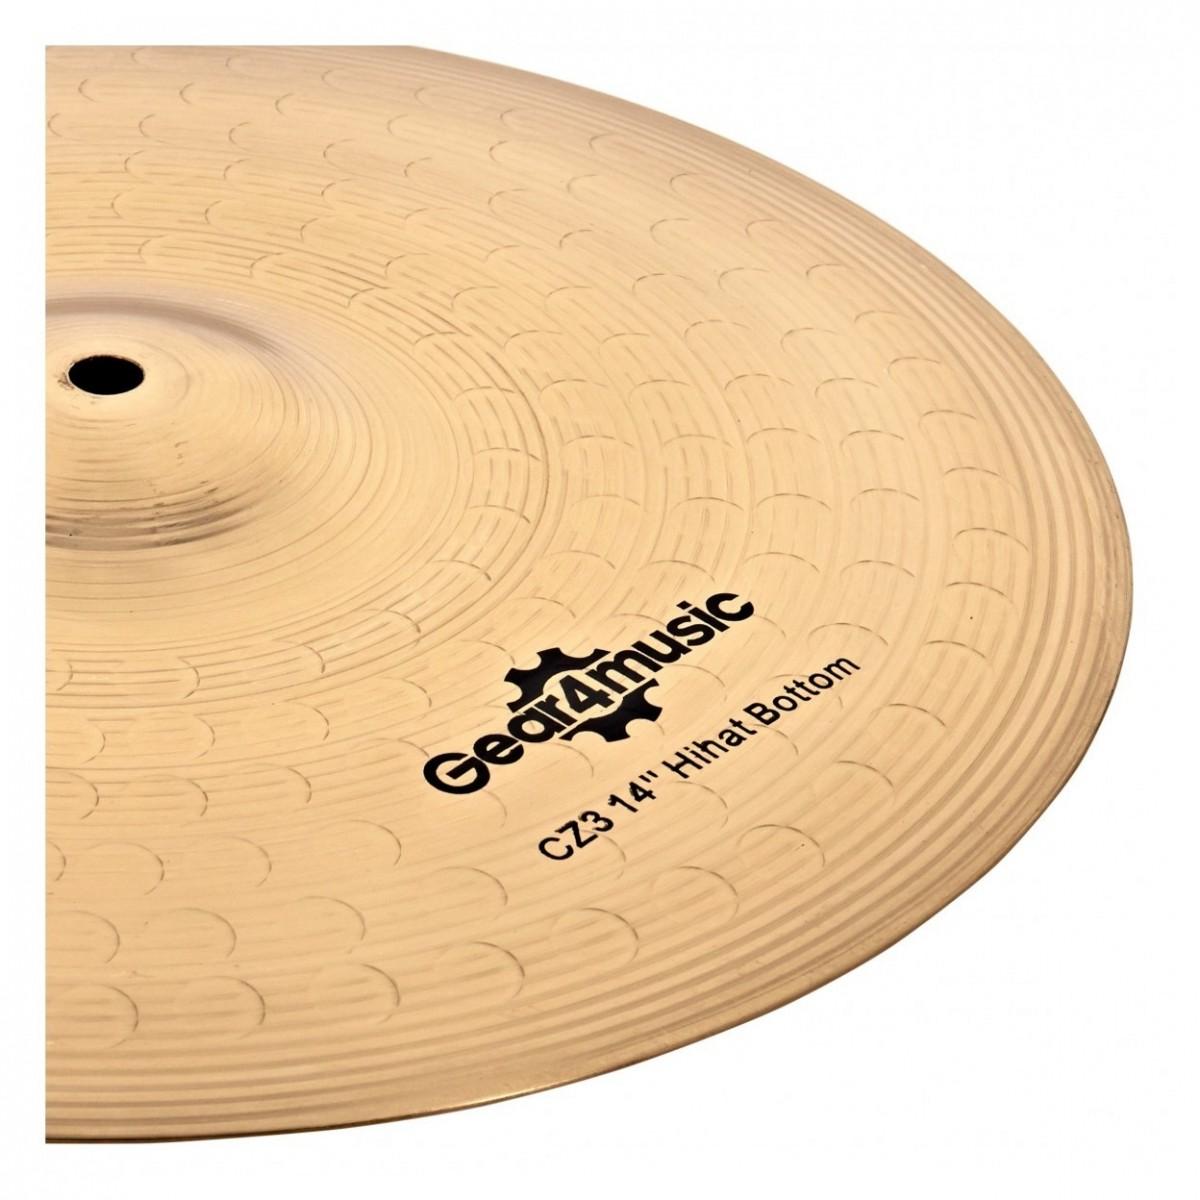 CZ3 20 Ride Cymbal by Gear4music